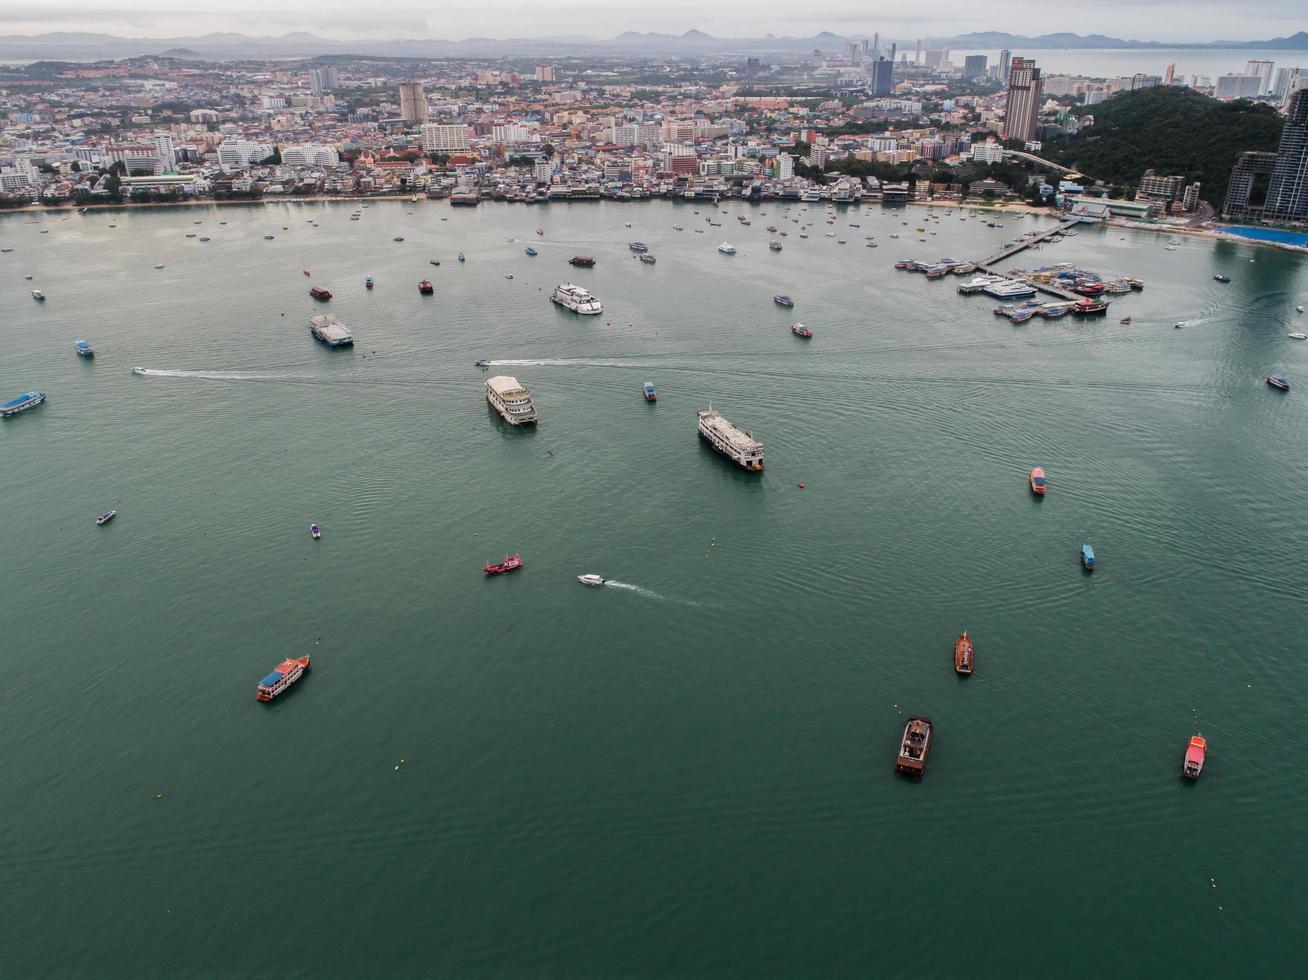 Flygfoto över Pattaya Beach, Thailand foto